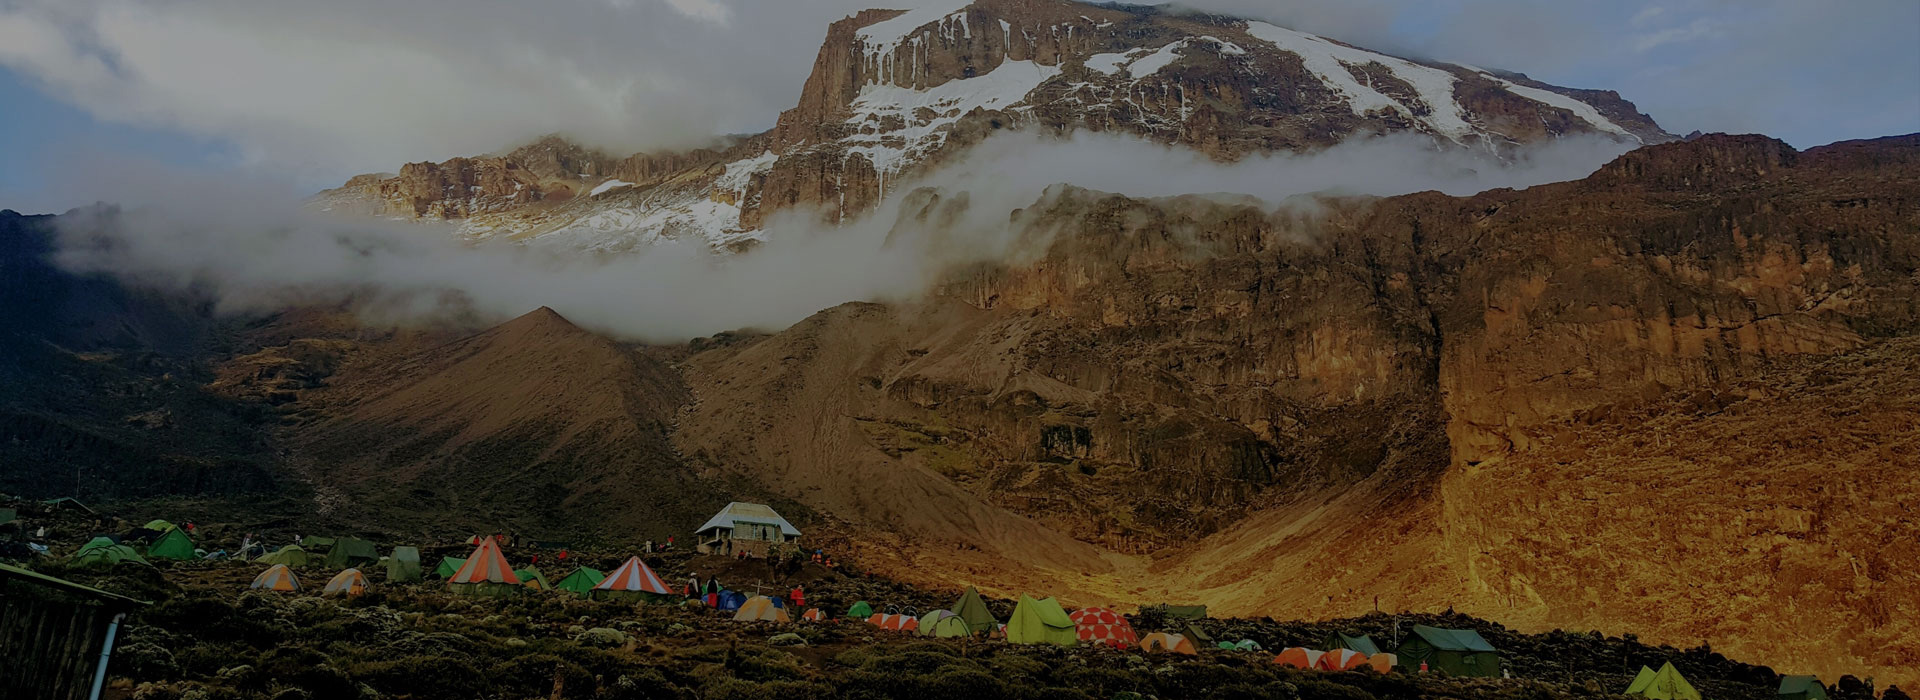 8 Days Mount Kilimanjaro Climb Rongai Route Safari